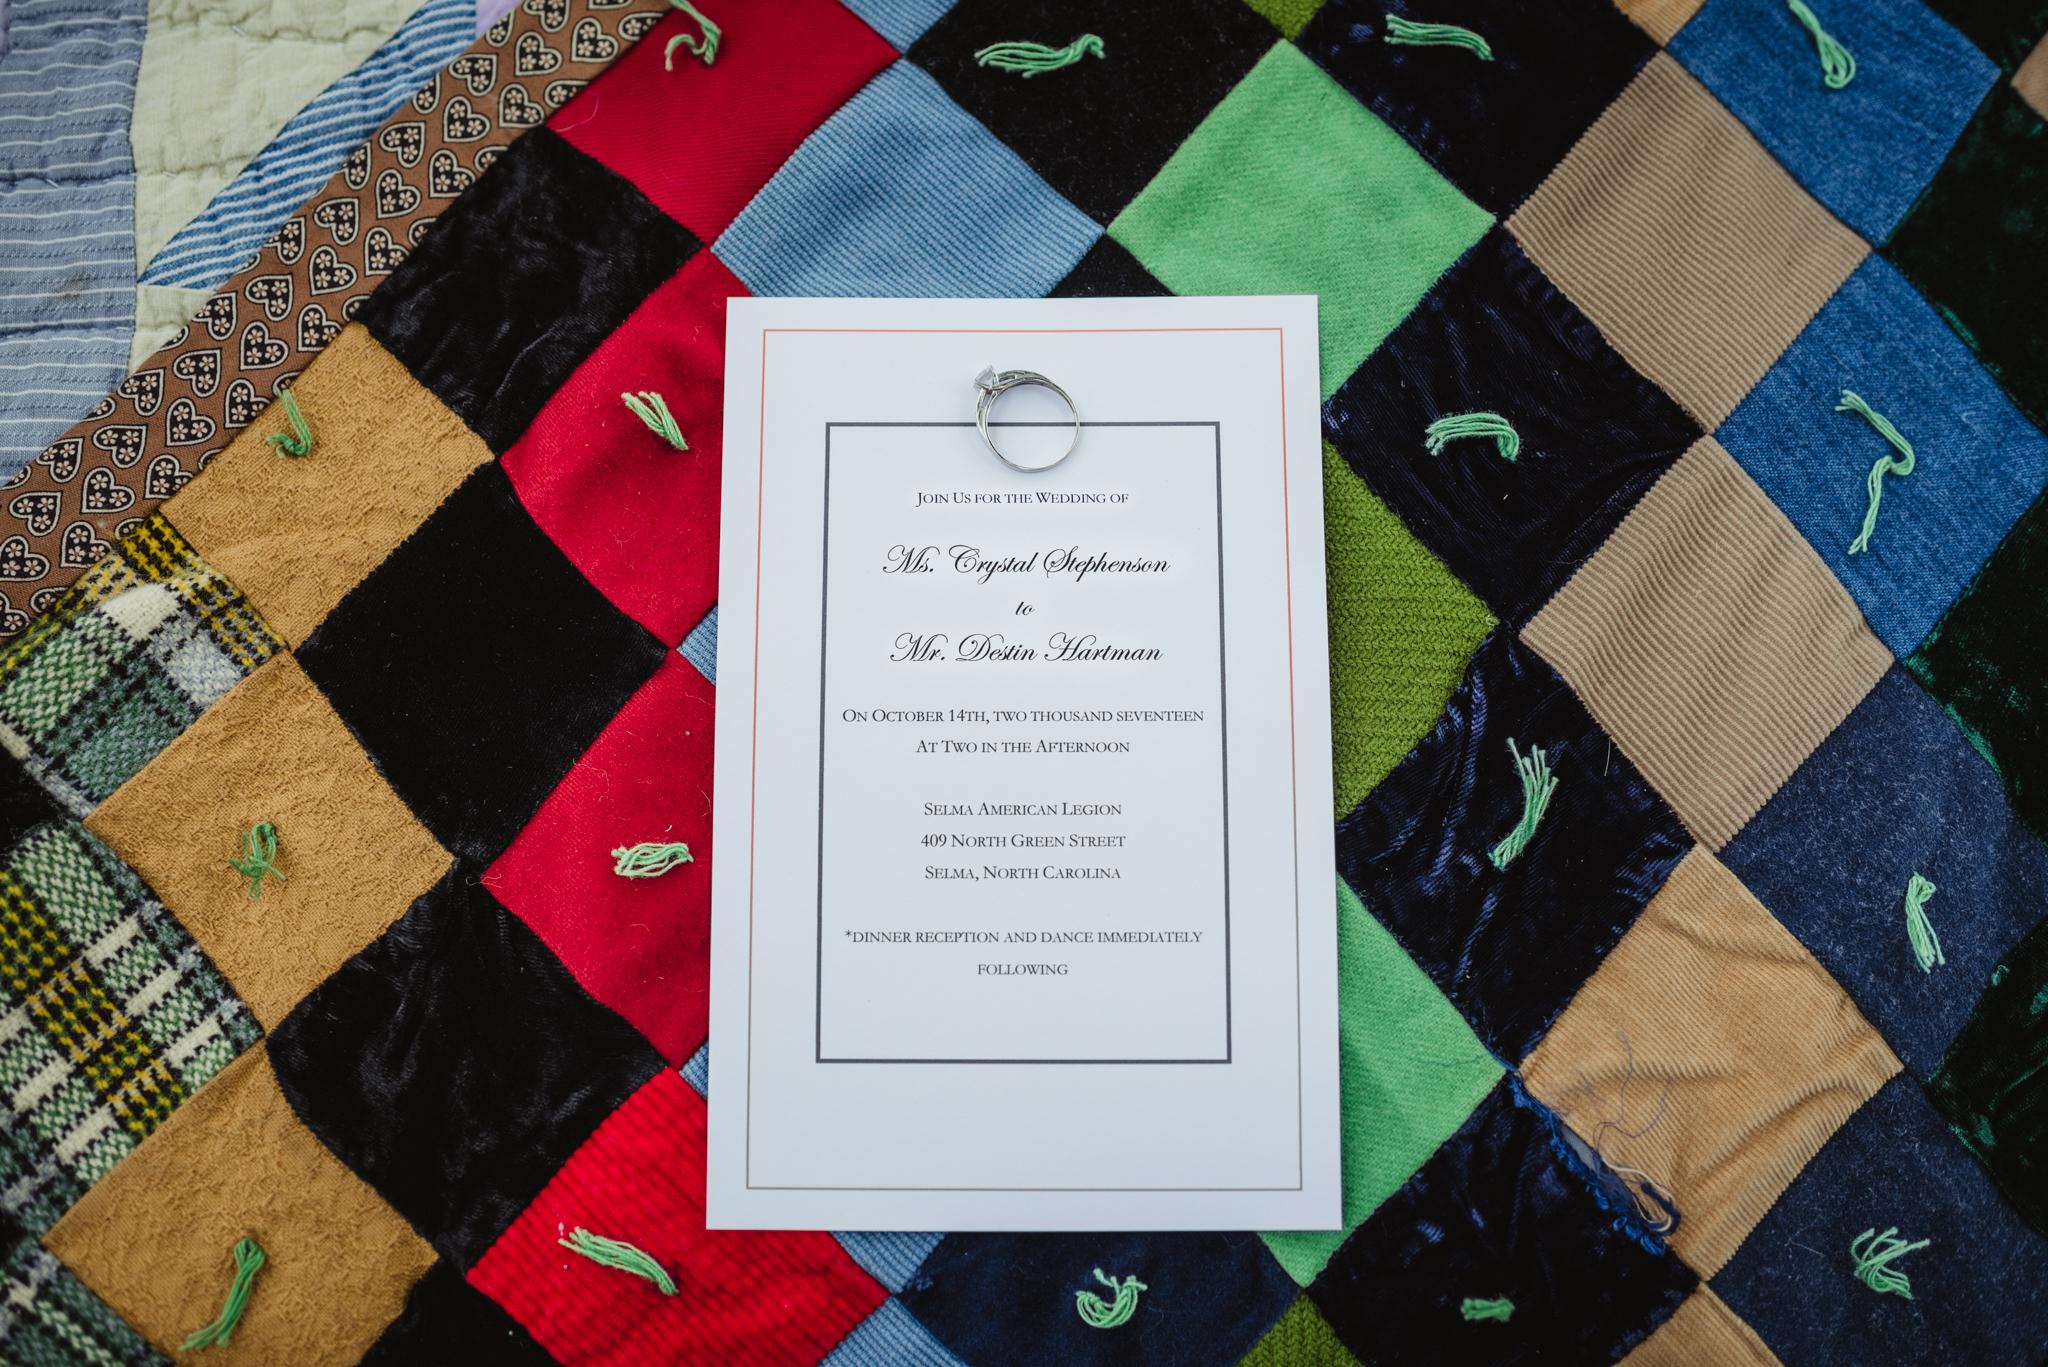 raleigh-wedding-invite-cd.jpg